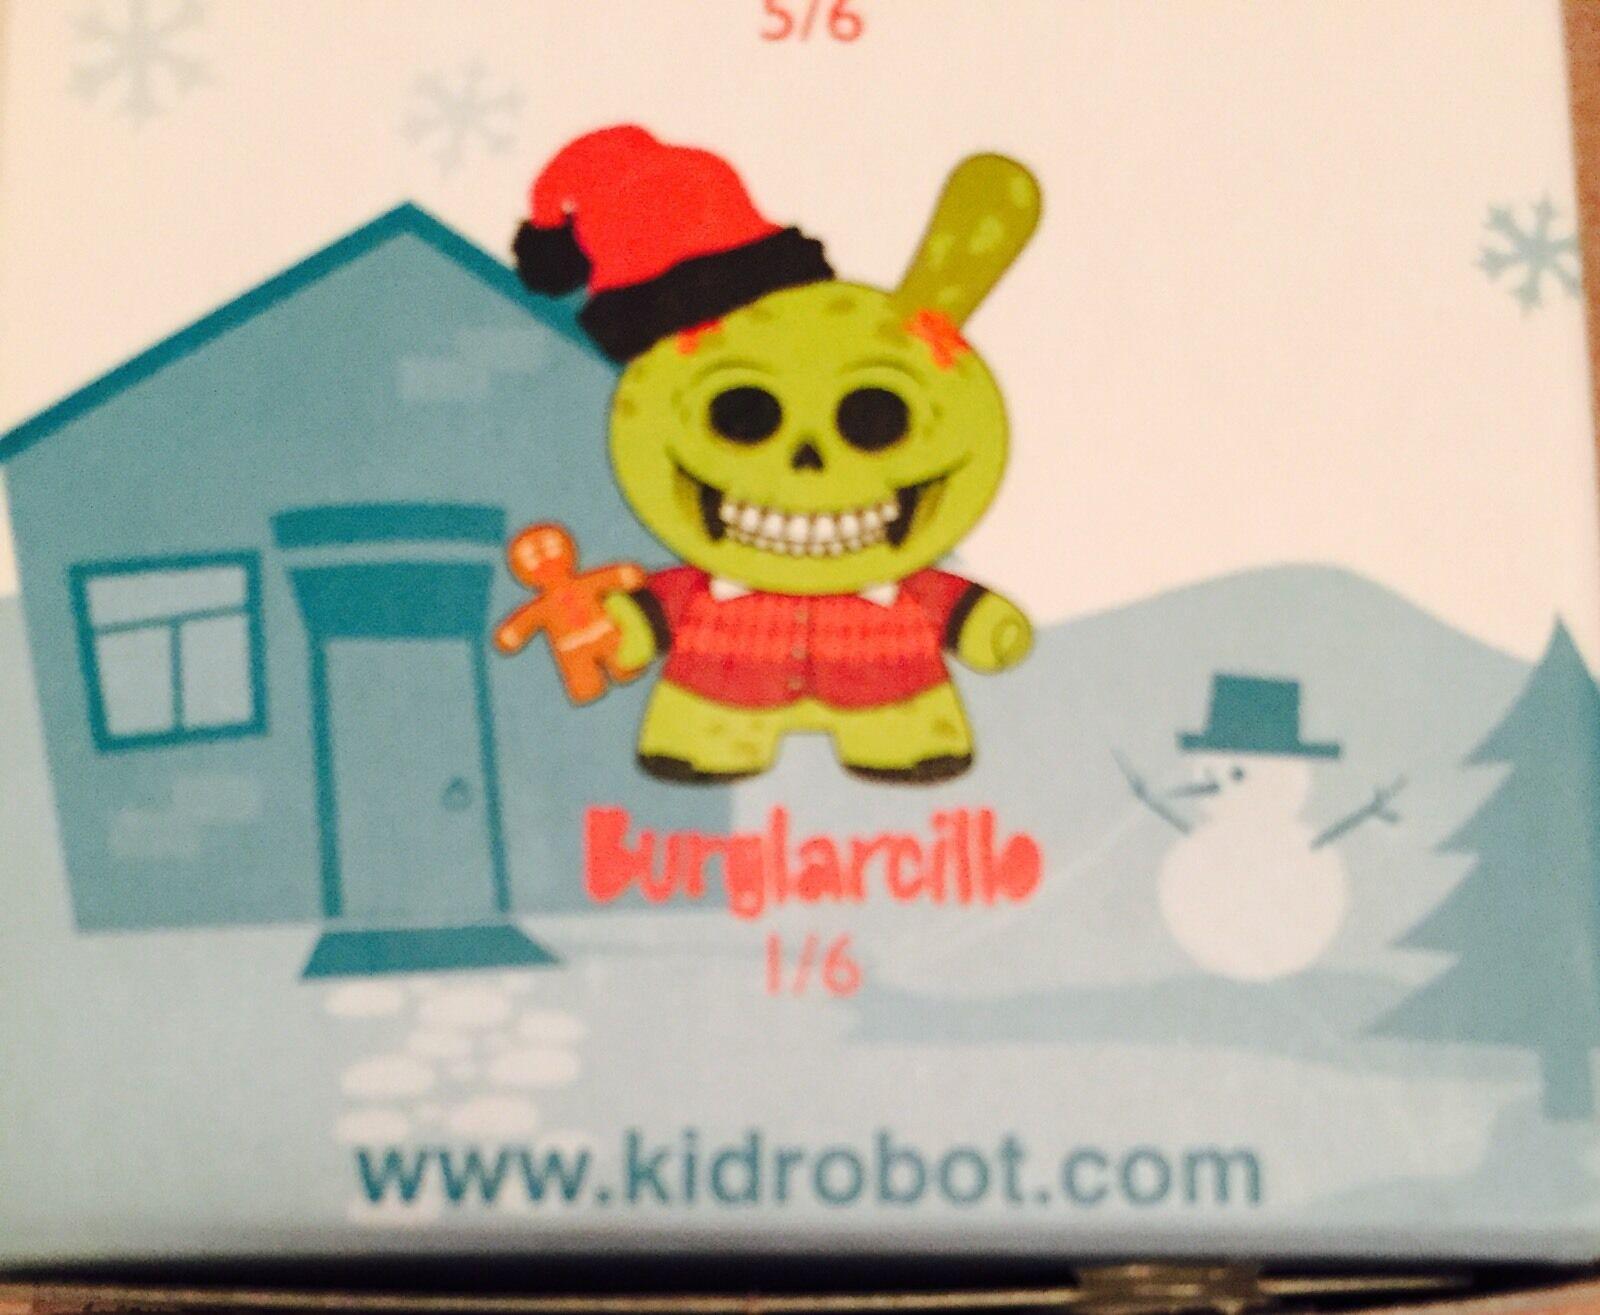 Sealed Kidrobot Christmas Exclusive Burglarcille Chase Chase Chase Saner Burglars Dunny 04517c